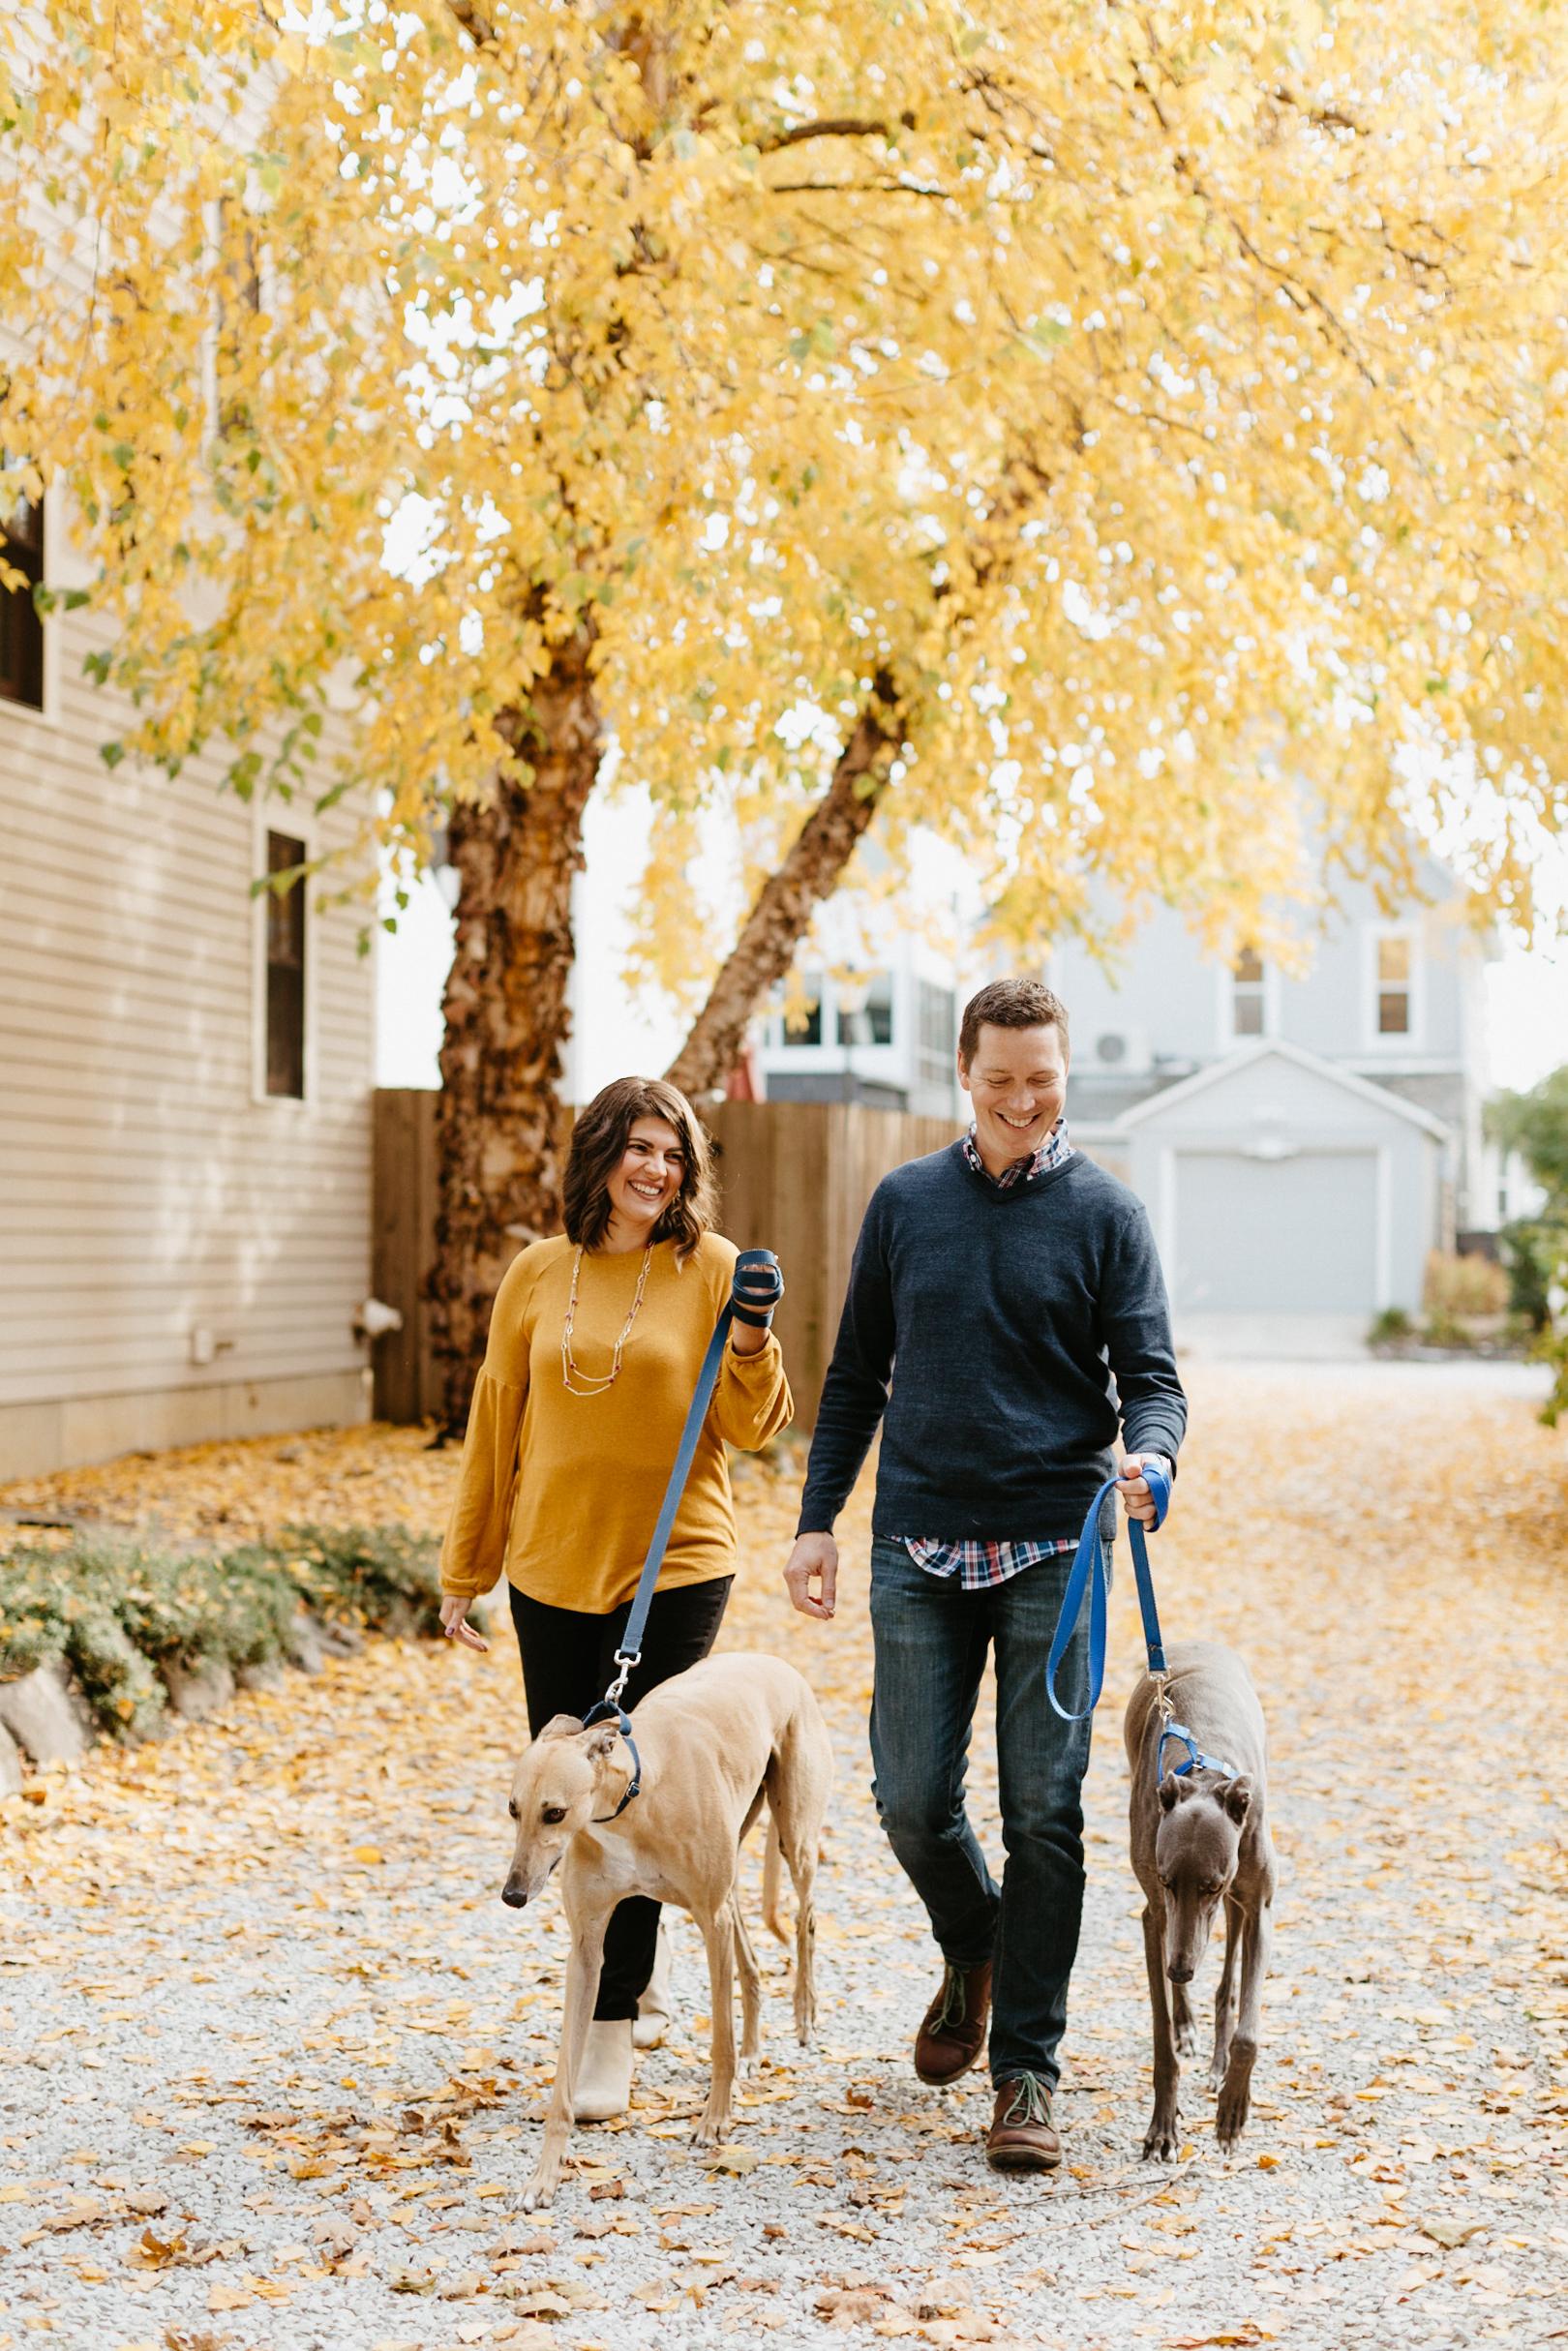 18-11-03 Stephanie and Michael Engagement Edited-13.jpg